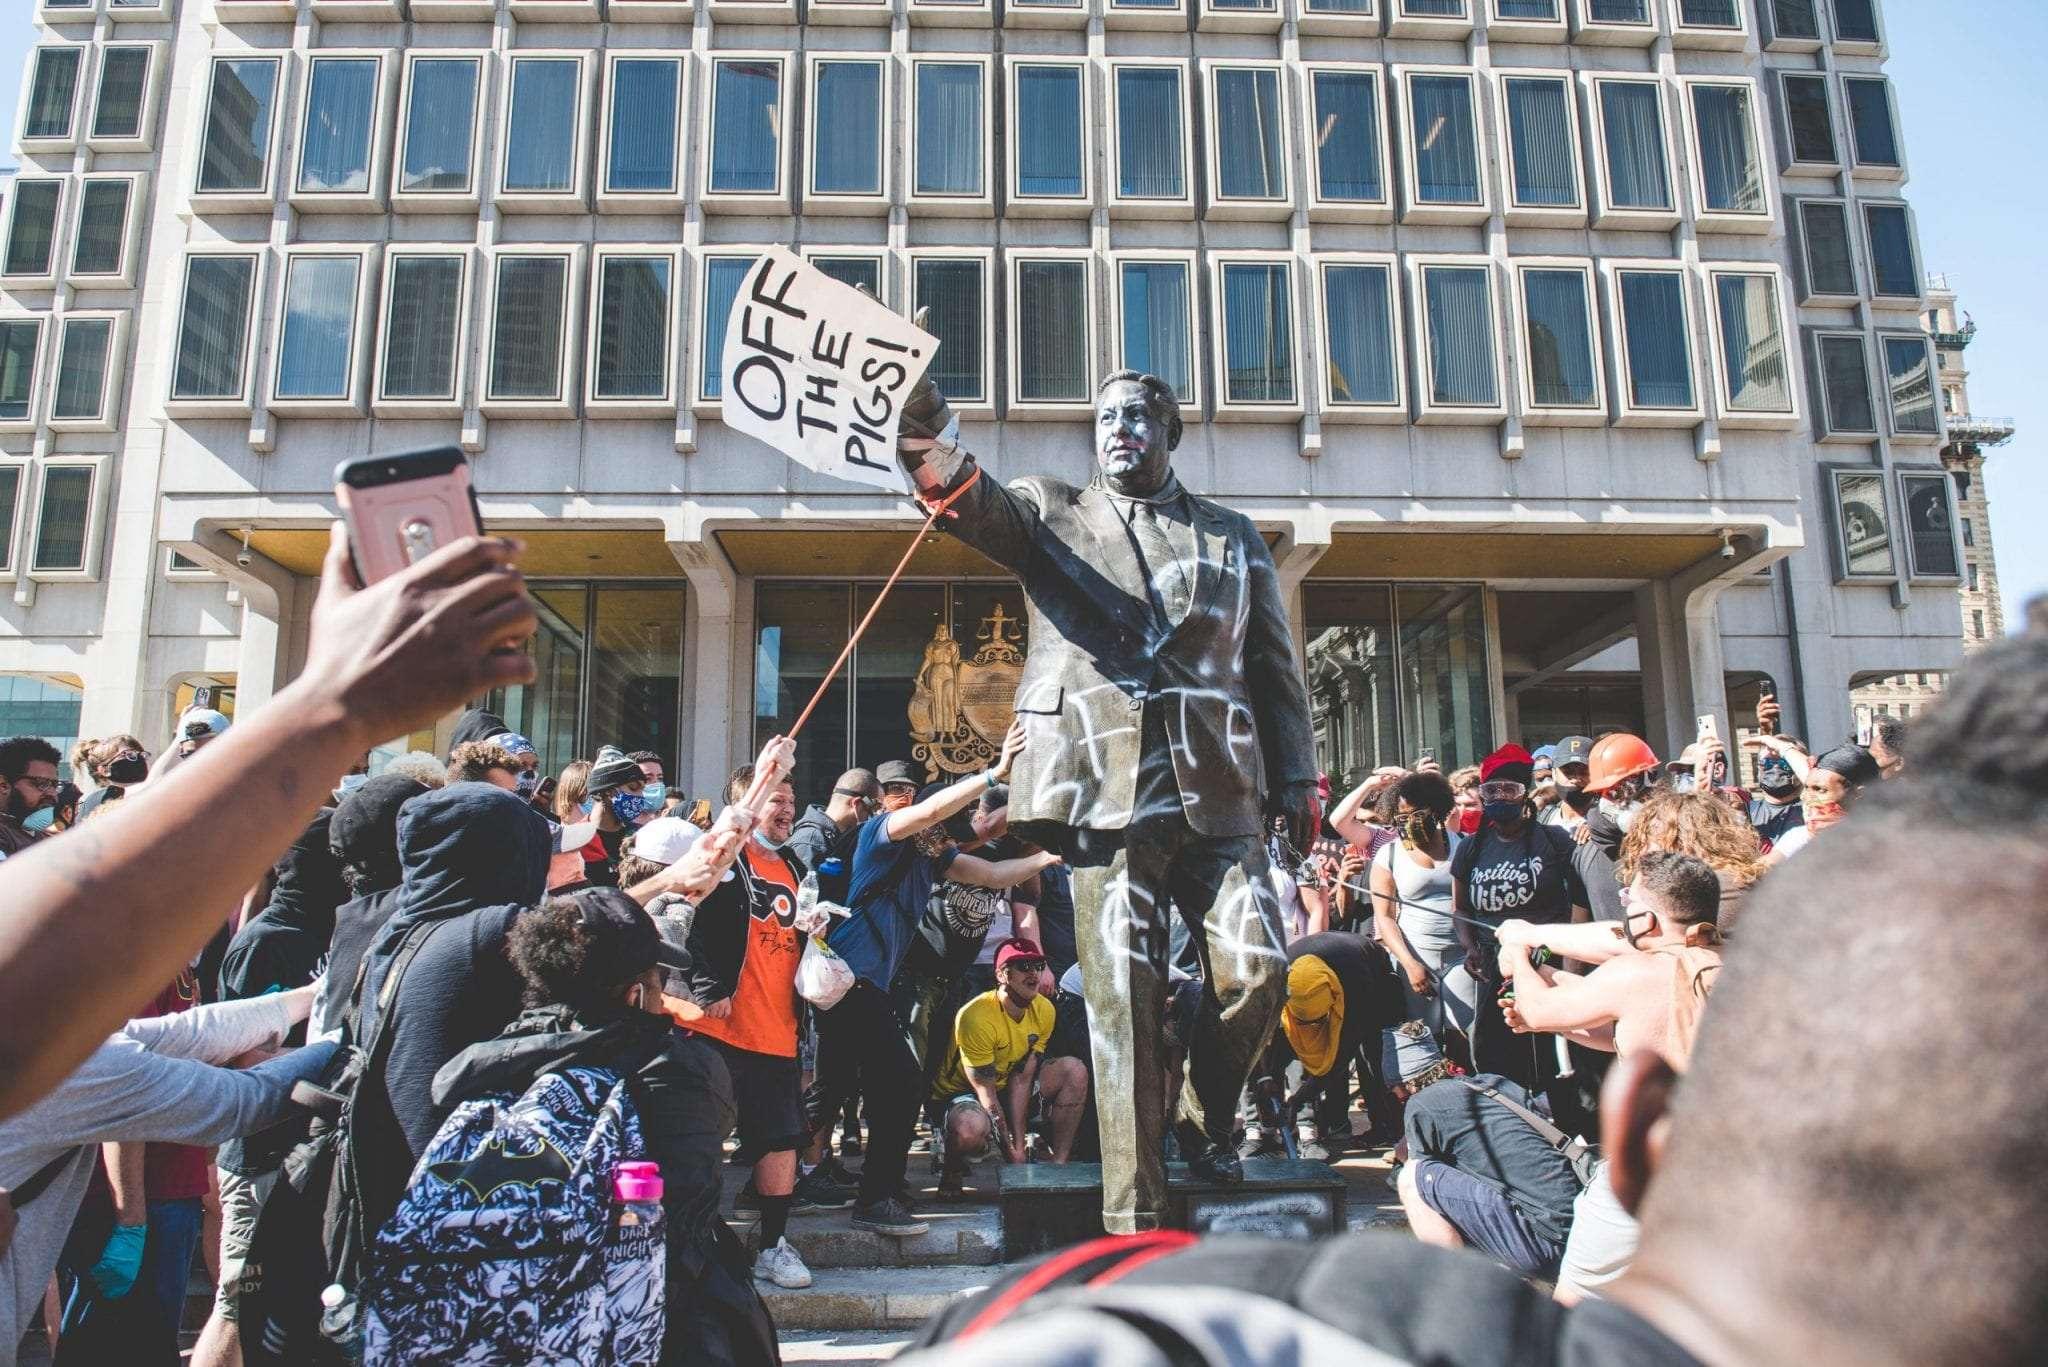 Frank Rizzo statue Philadelphia protests